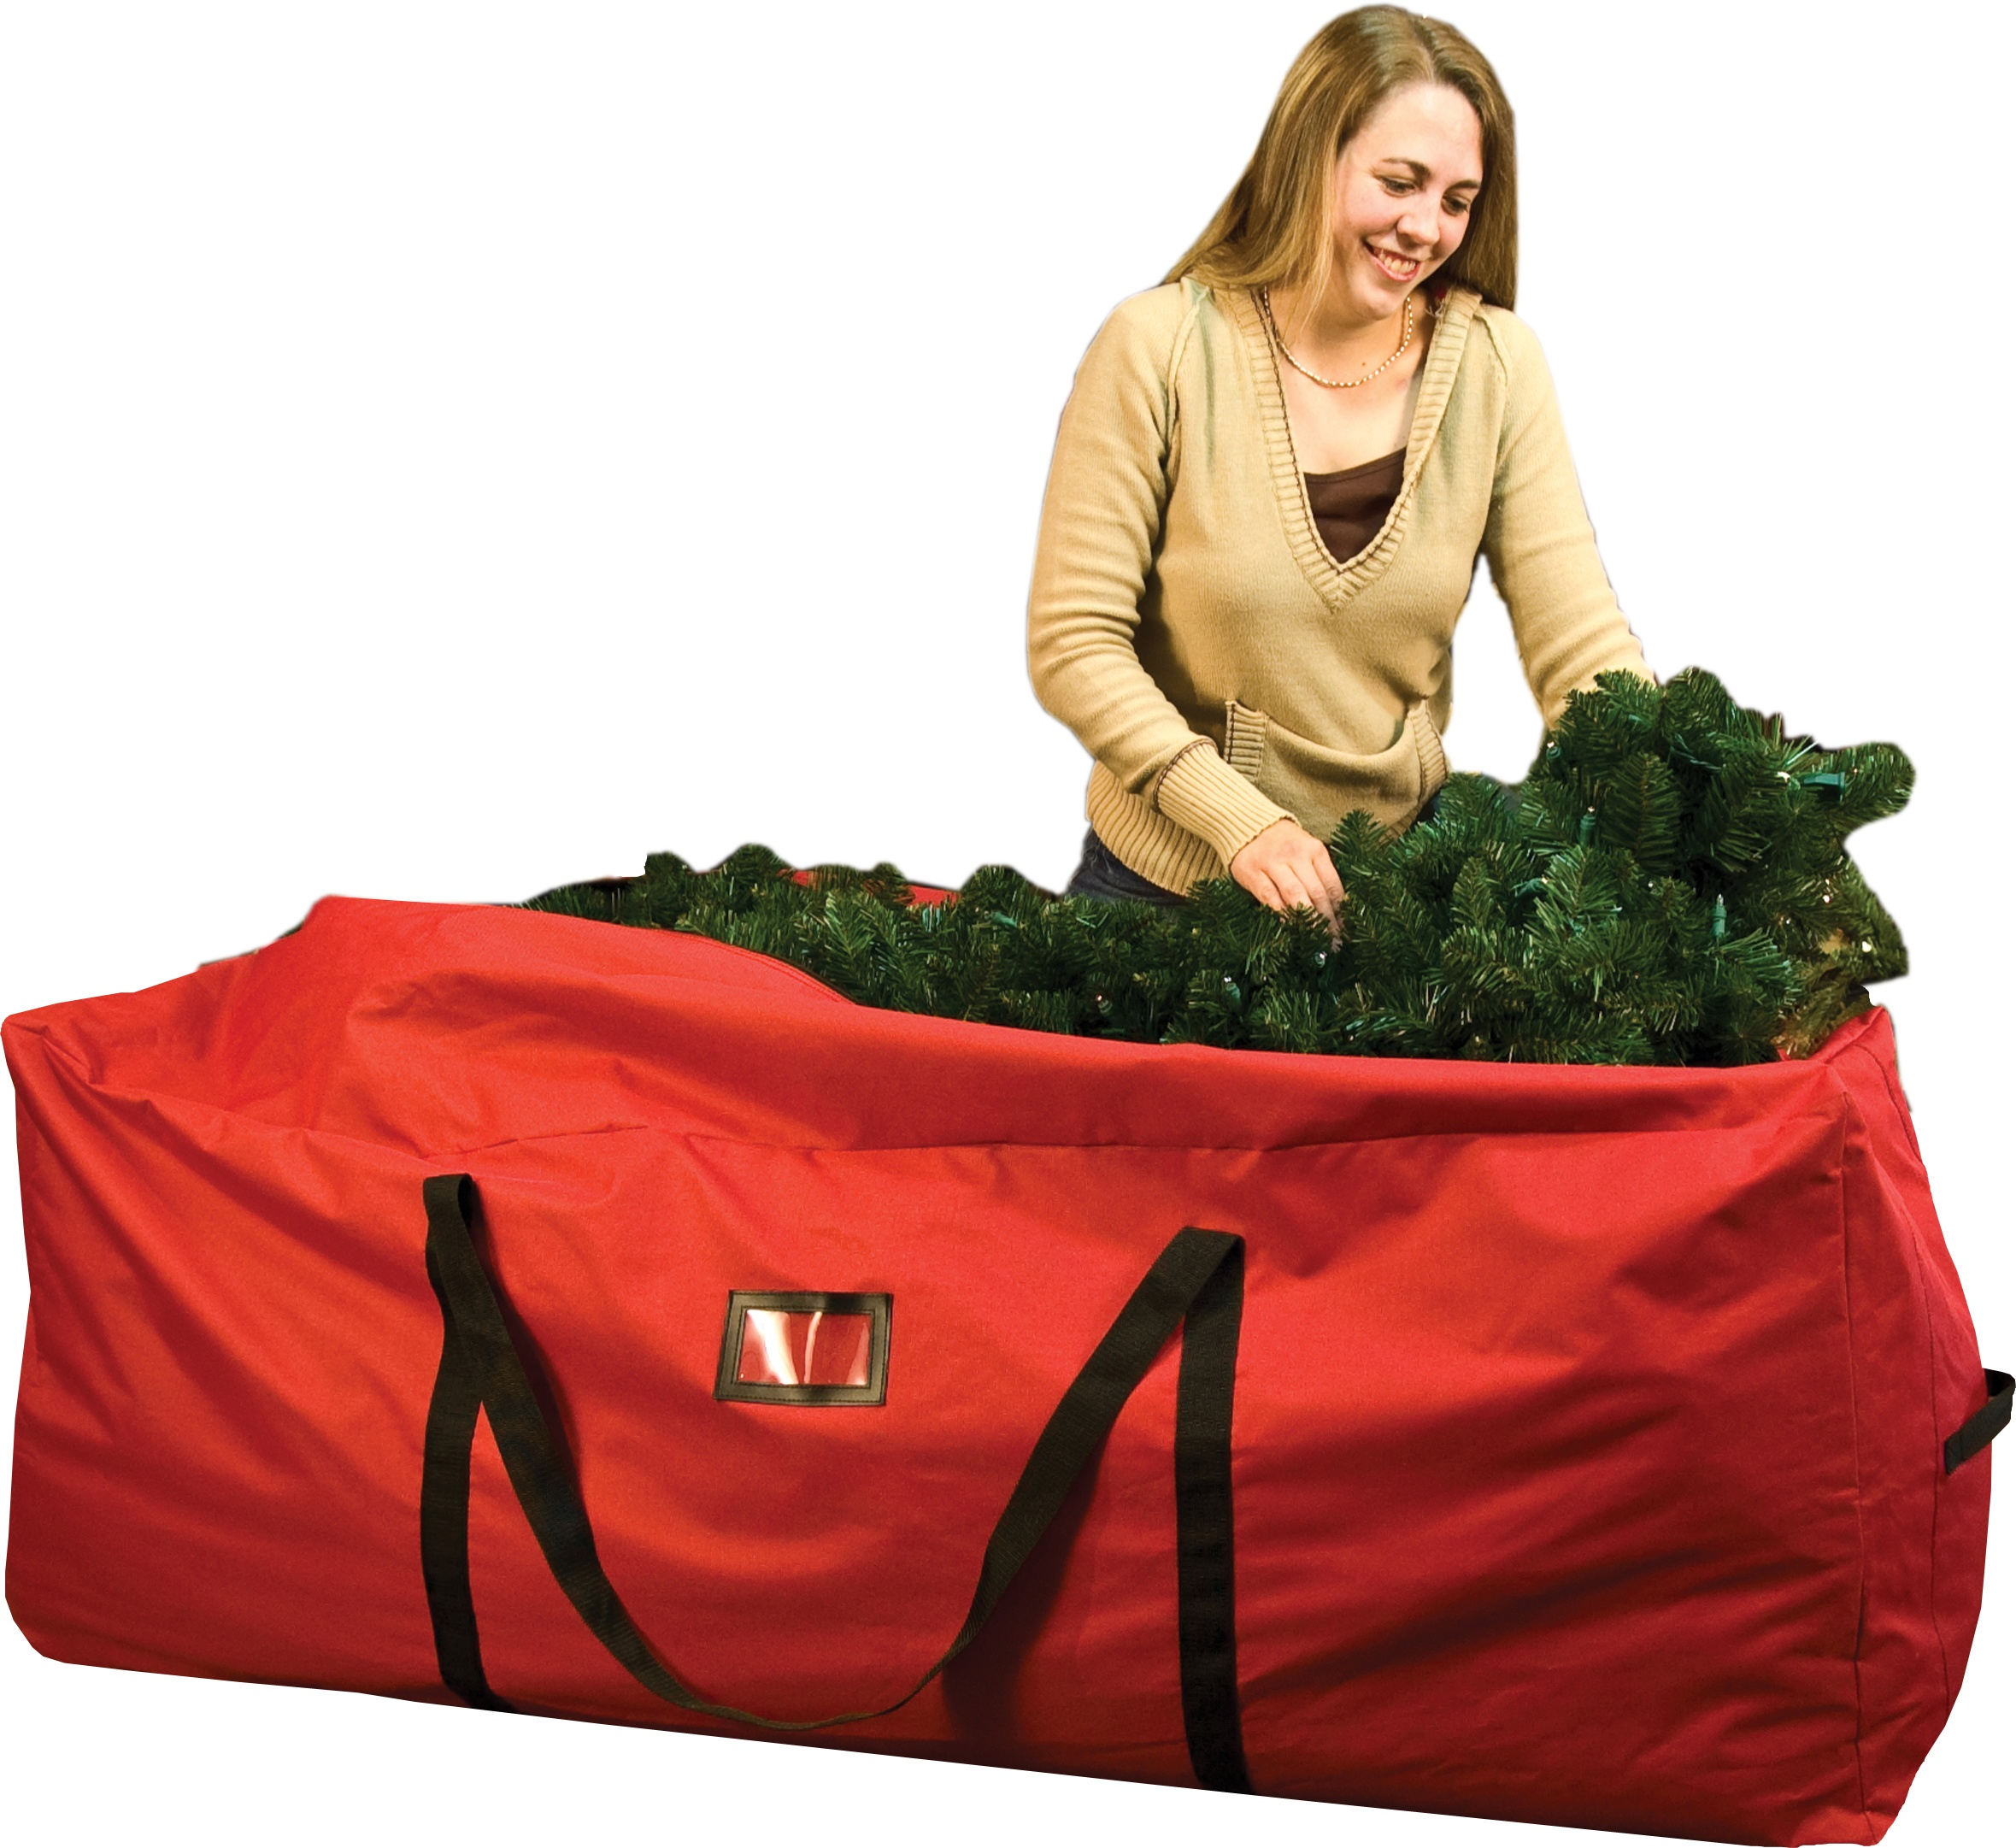 christmas tree storage bags rolling christmas tree storage bag for 6 9 trees - Rolling Christmas Tree Storage Bag